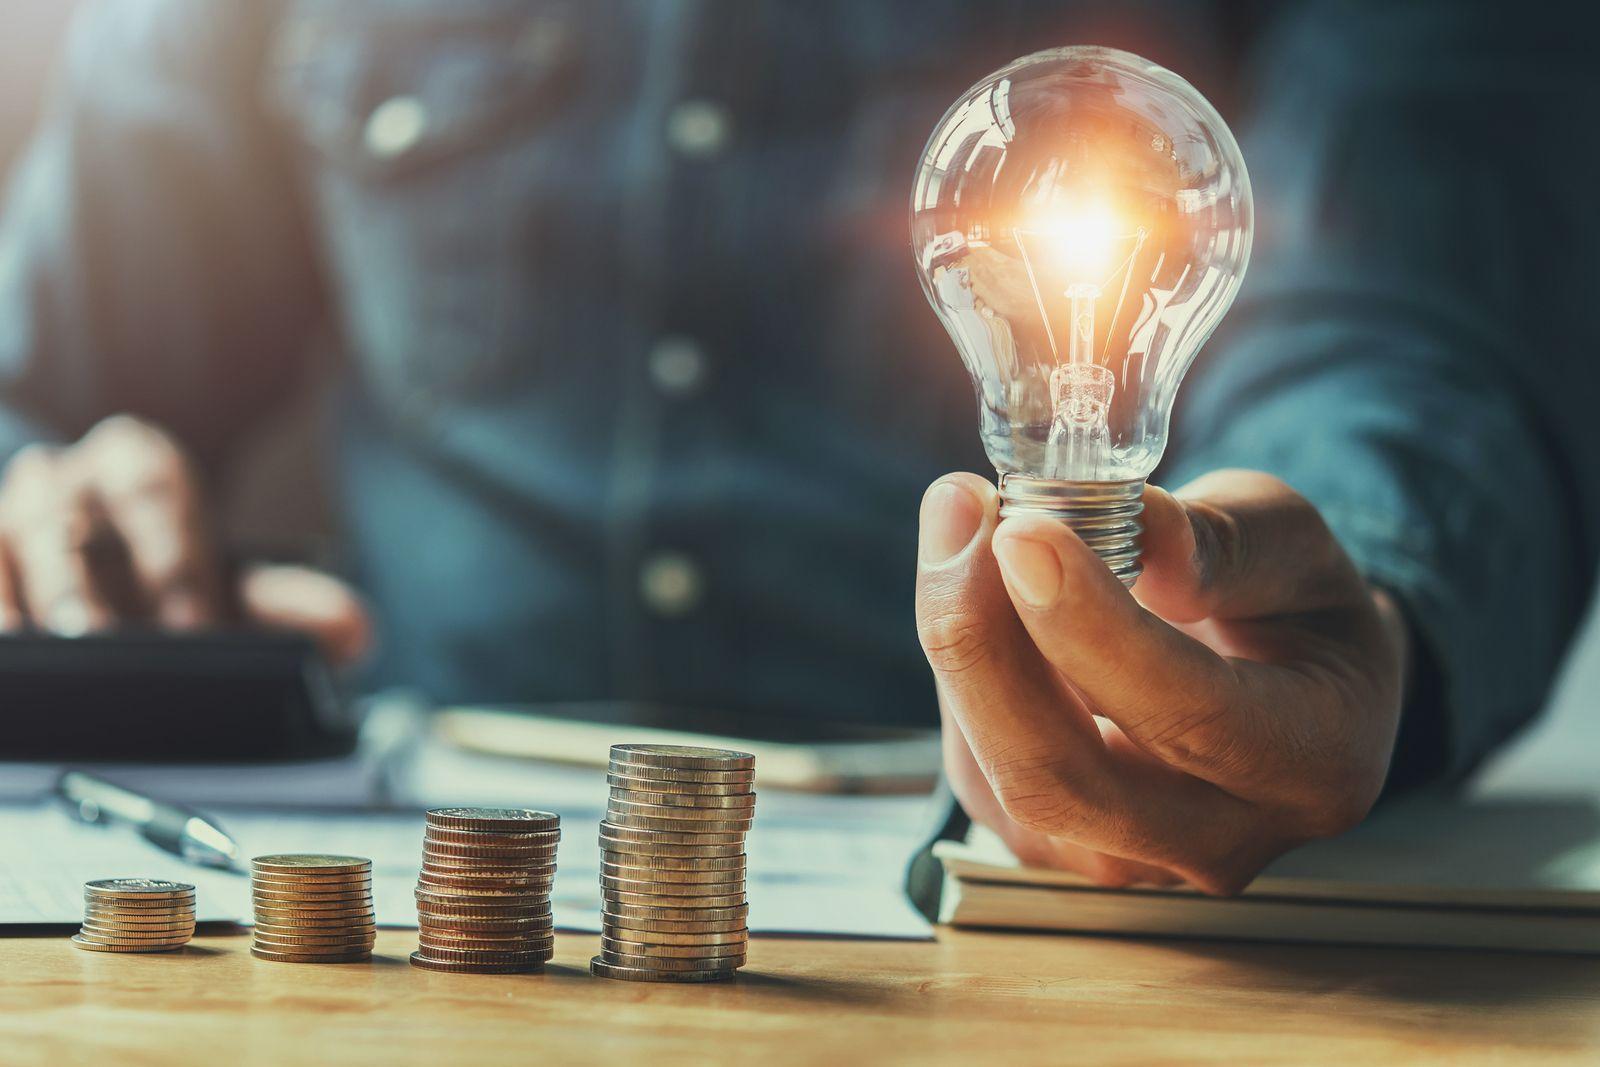 Energy Consumption Bills